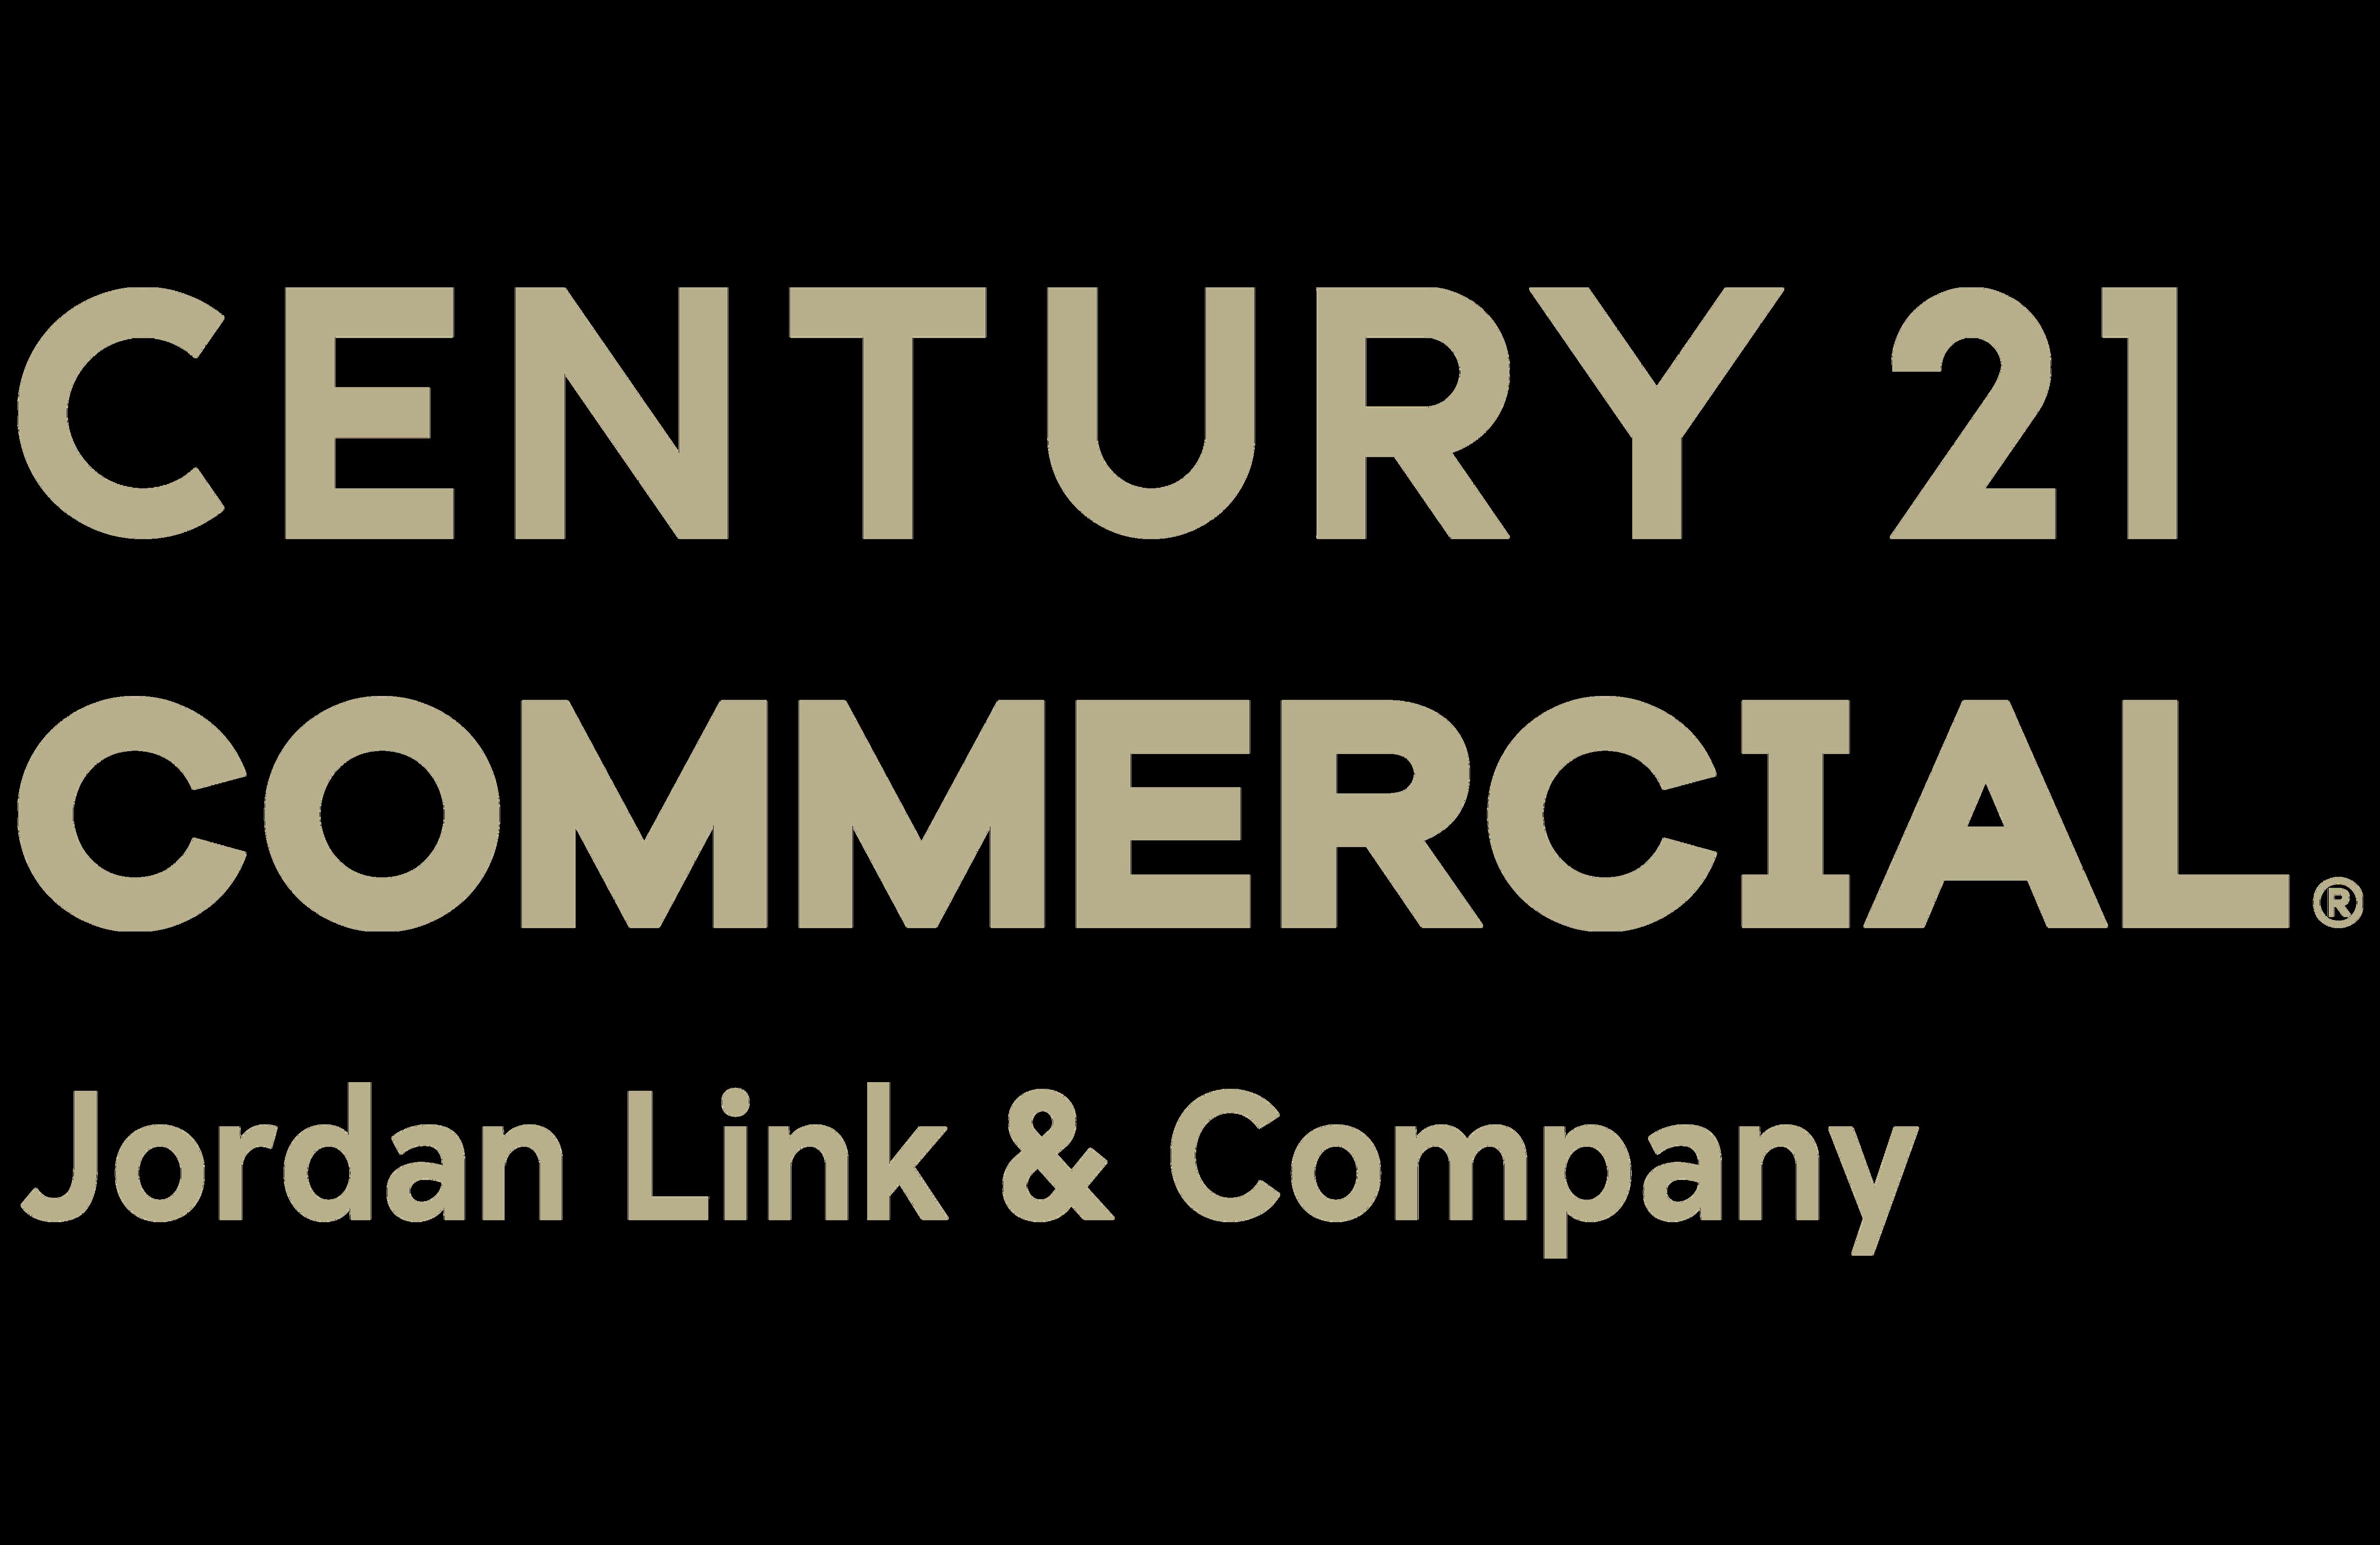 Mohamed Huzaibi of CENTURY 21 Jordan Link & Company logo